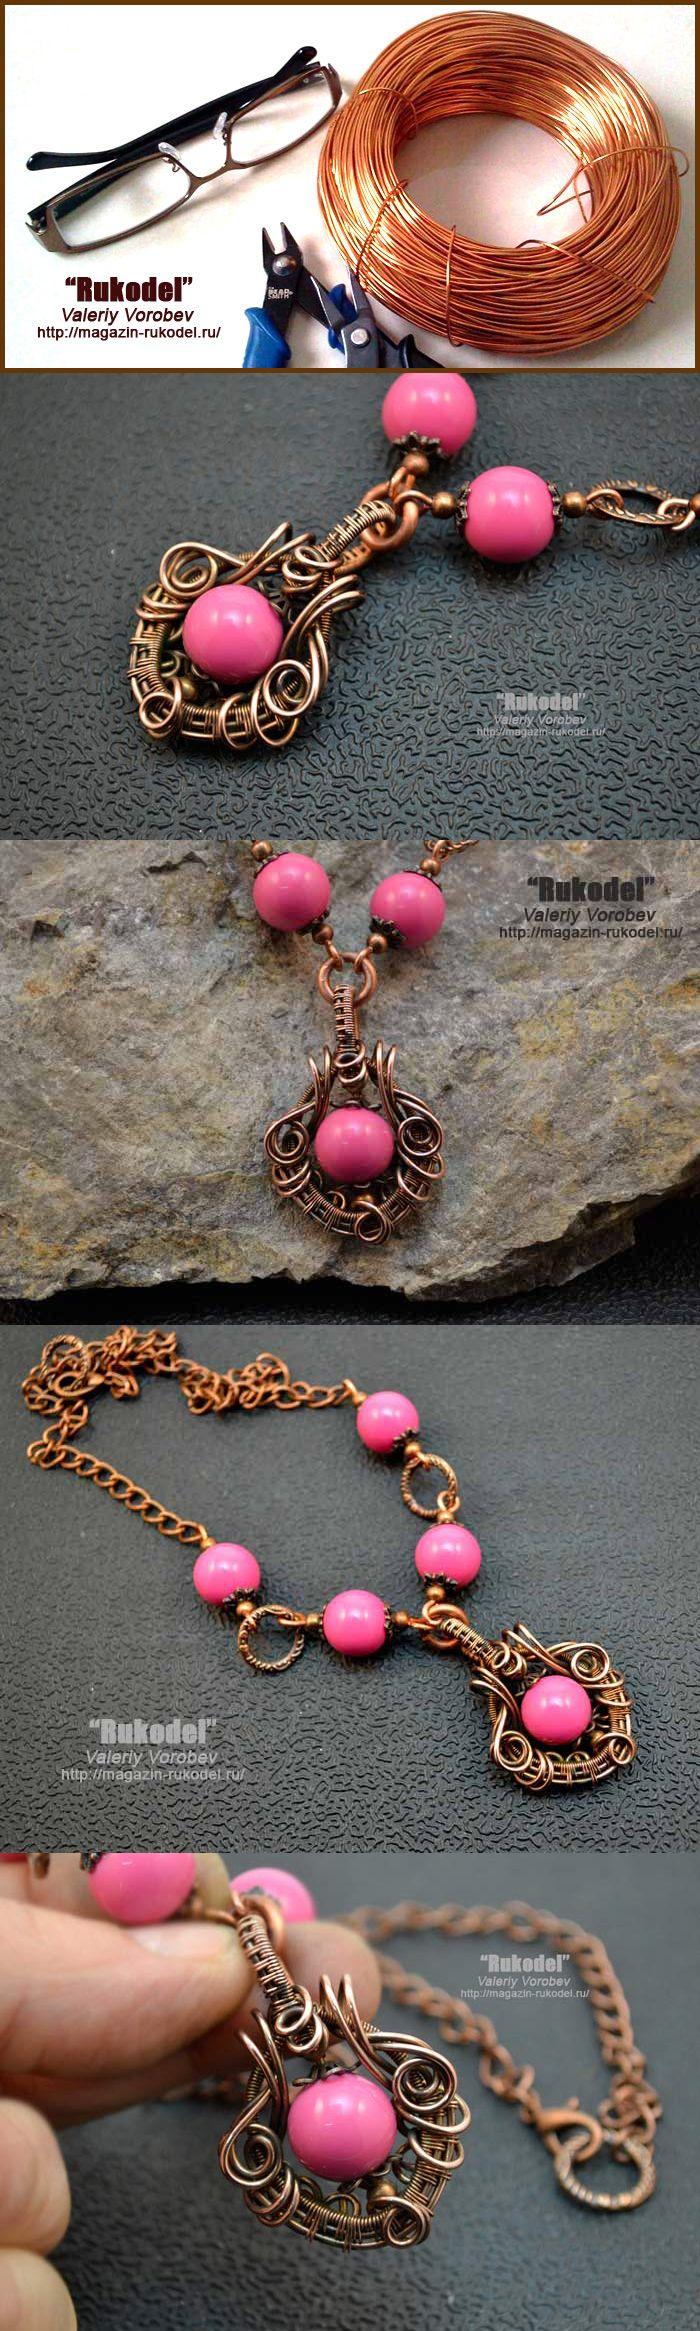 Ожерелье из проволоки своими руками в технике Wire Wrap. | Рукодел